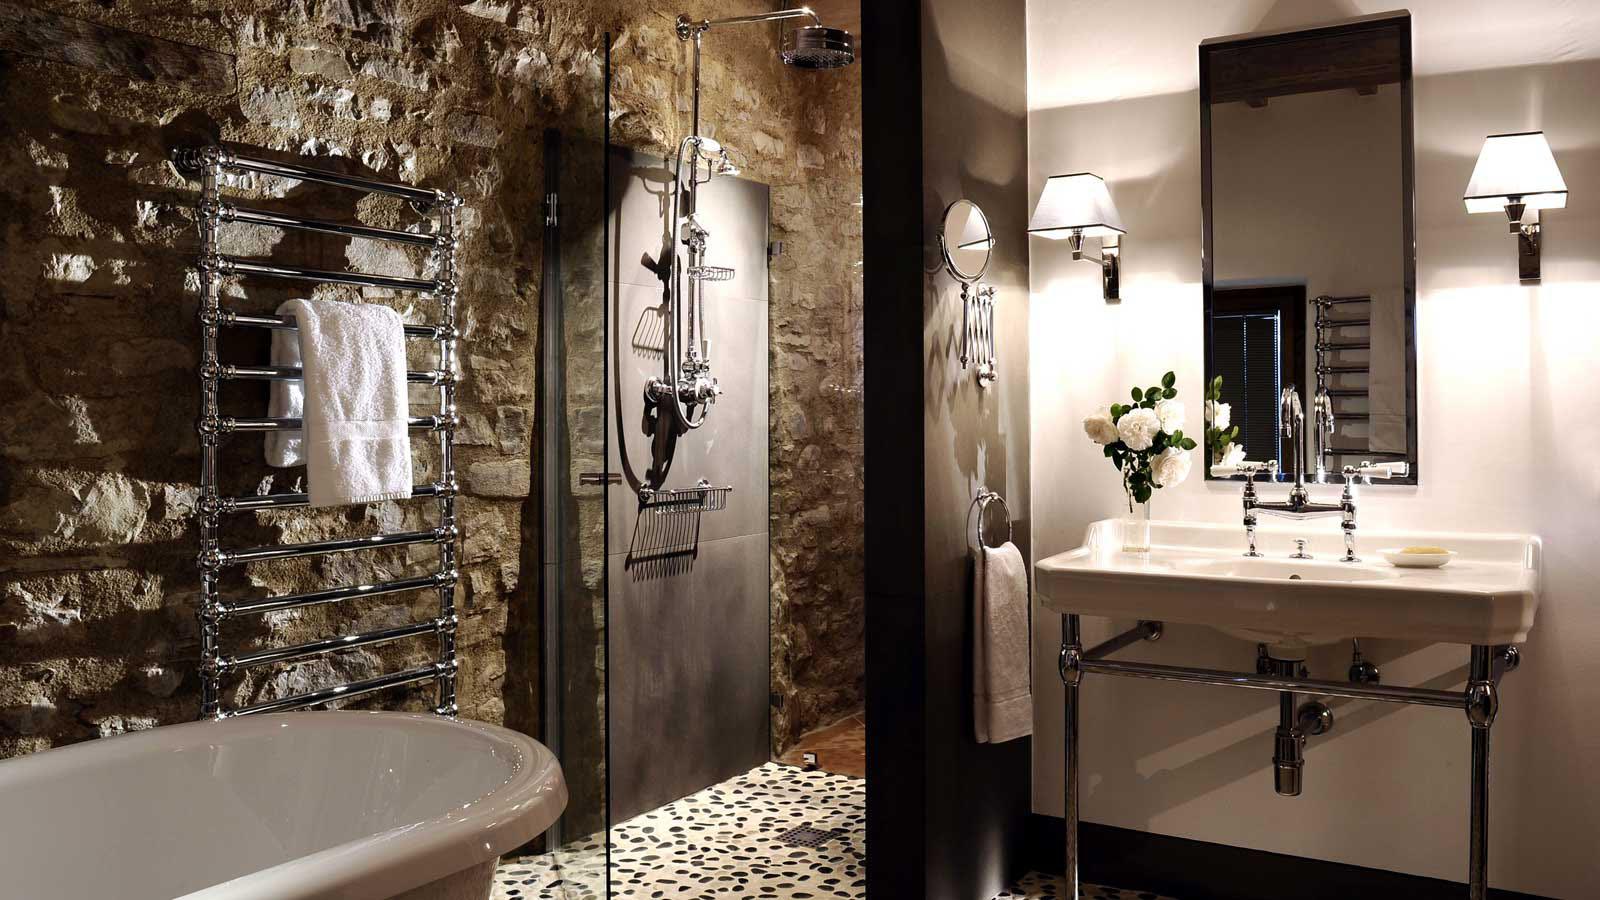 Castello Di Reschio Estate In Umbria  iDesignArch  Interior Design Architecture  Interior